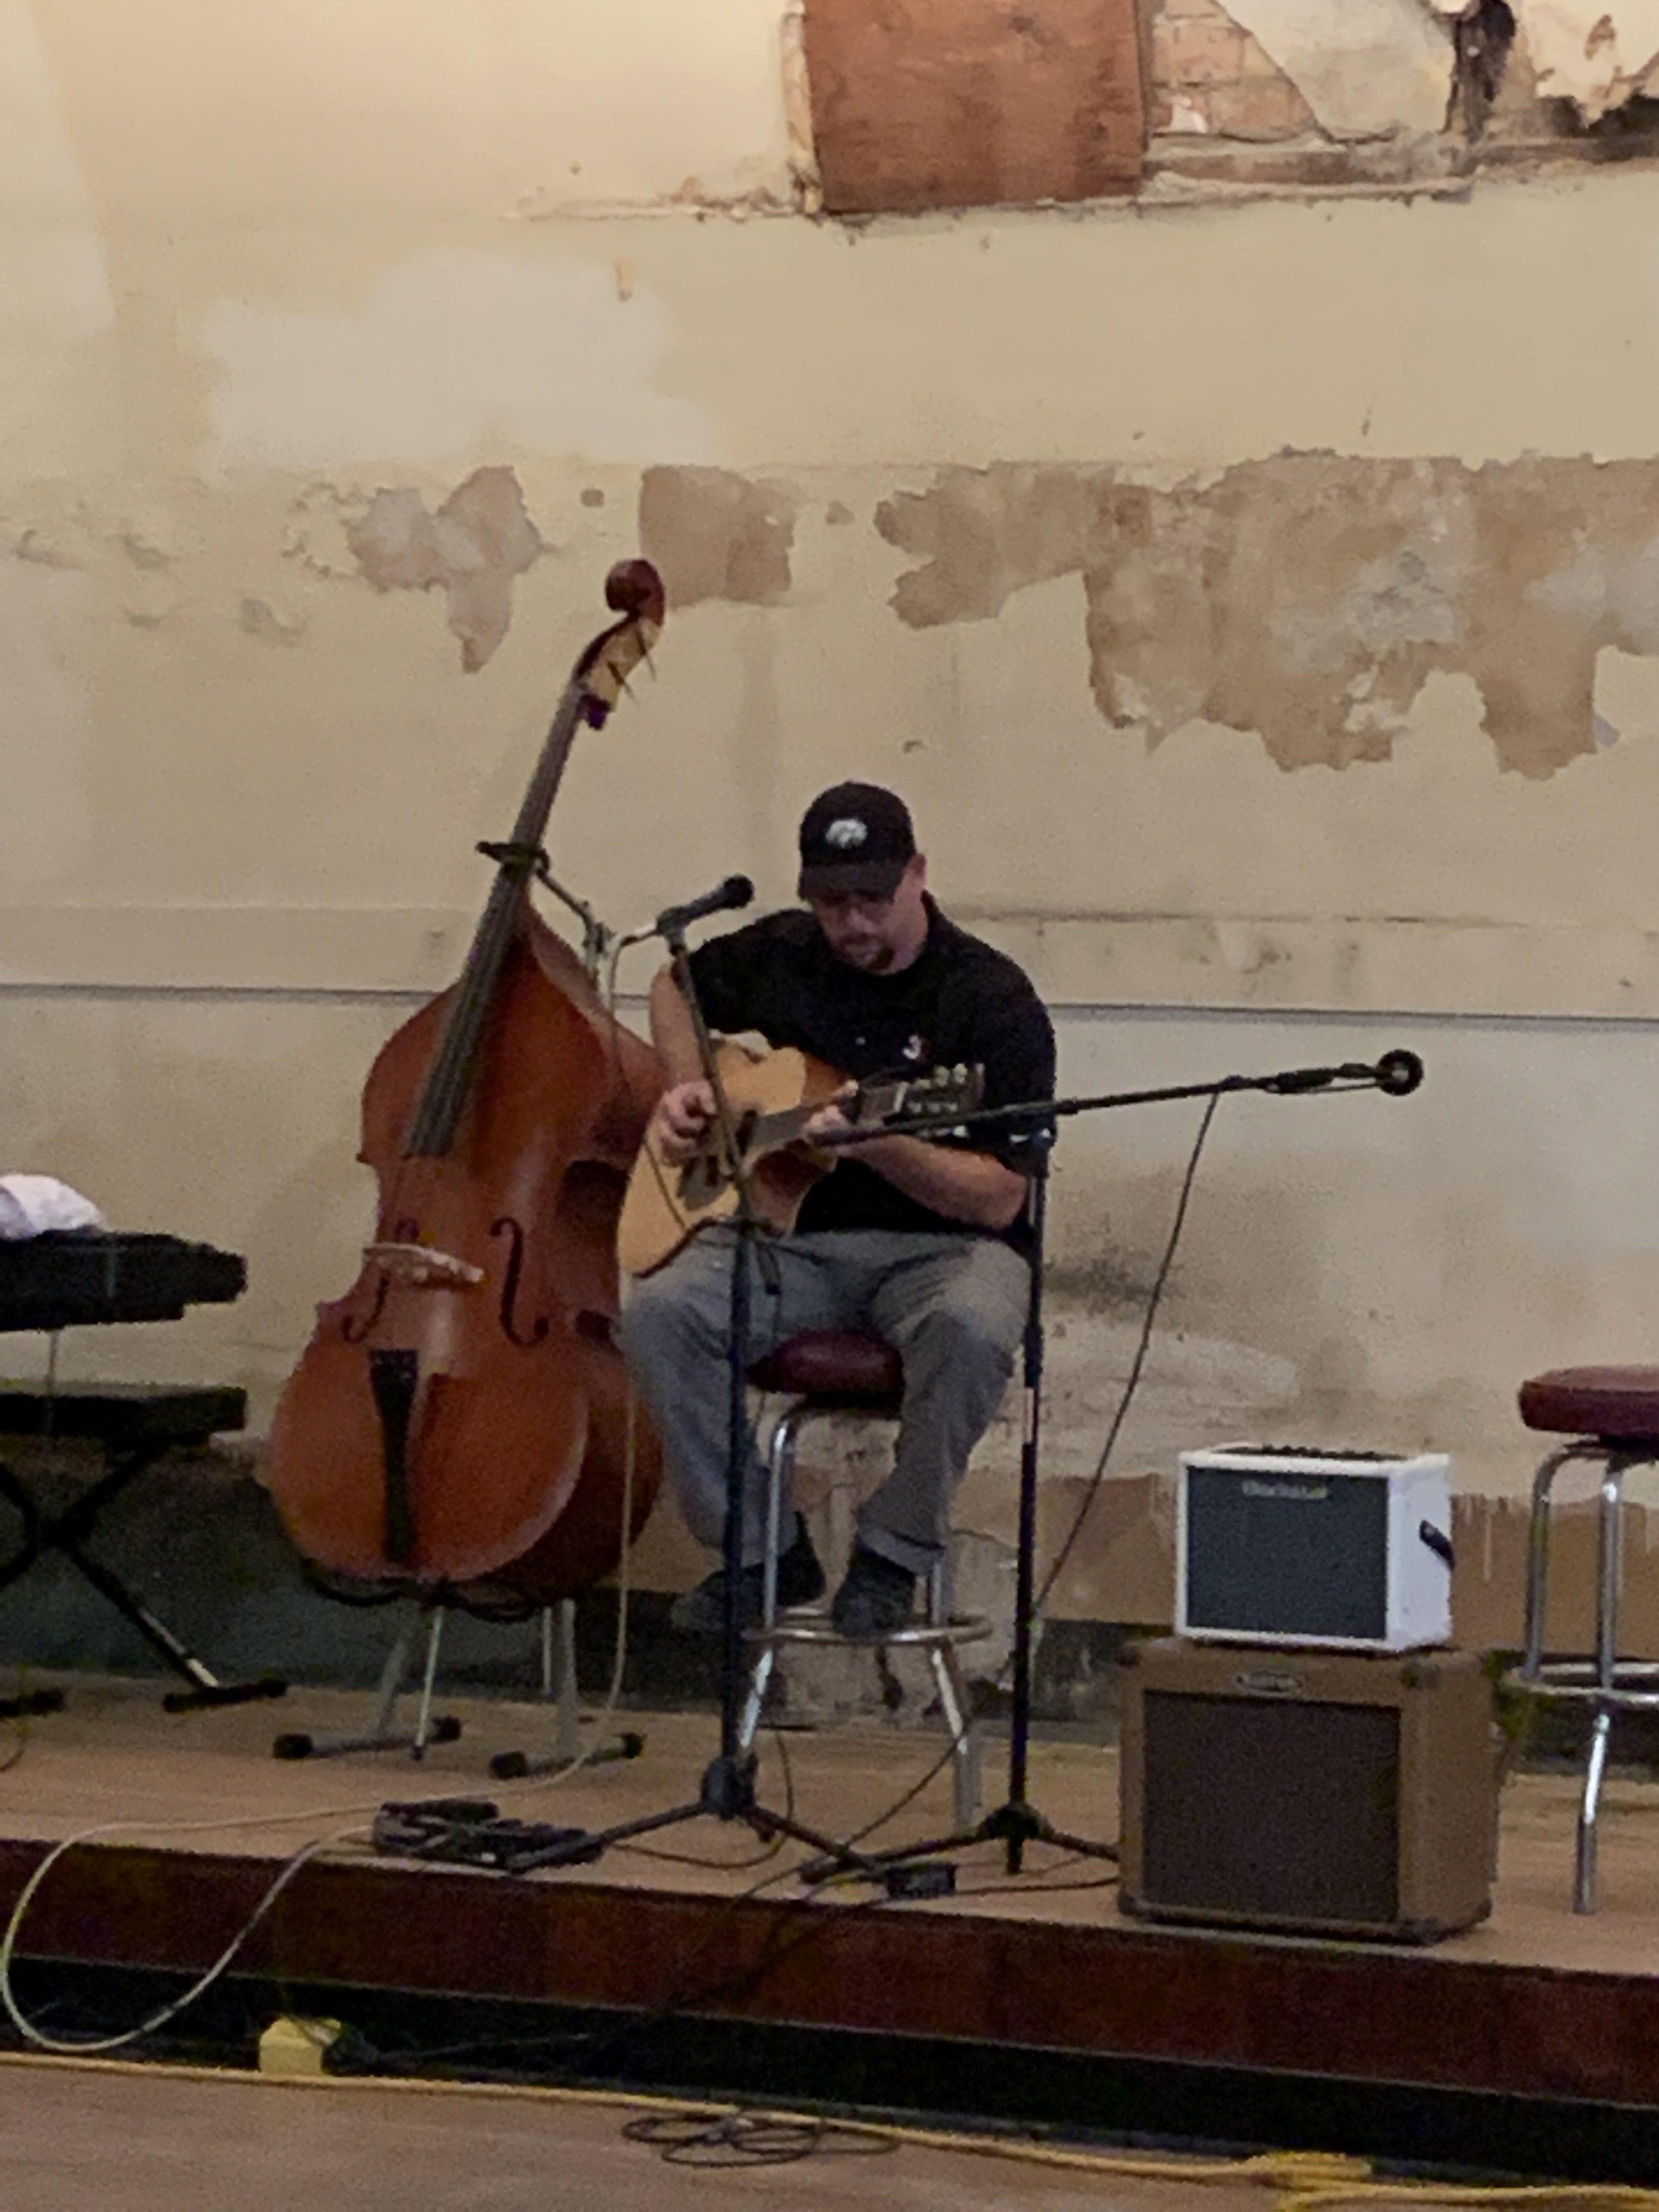 Local Live Music Night - Jake Pulis